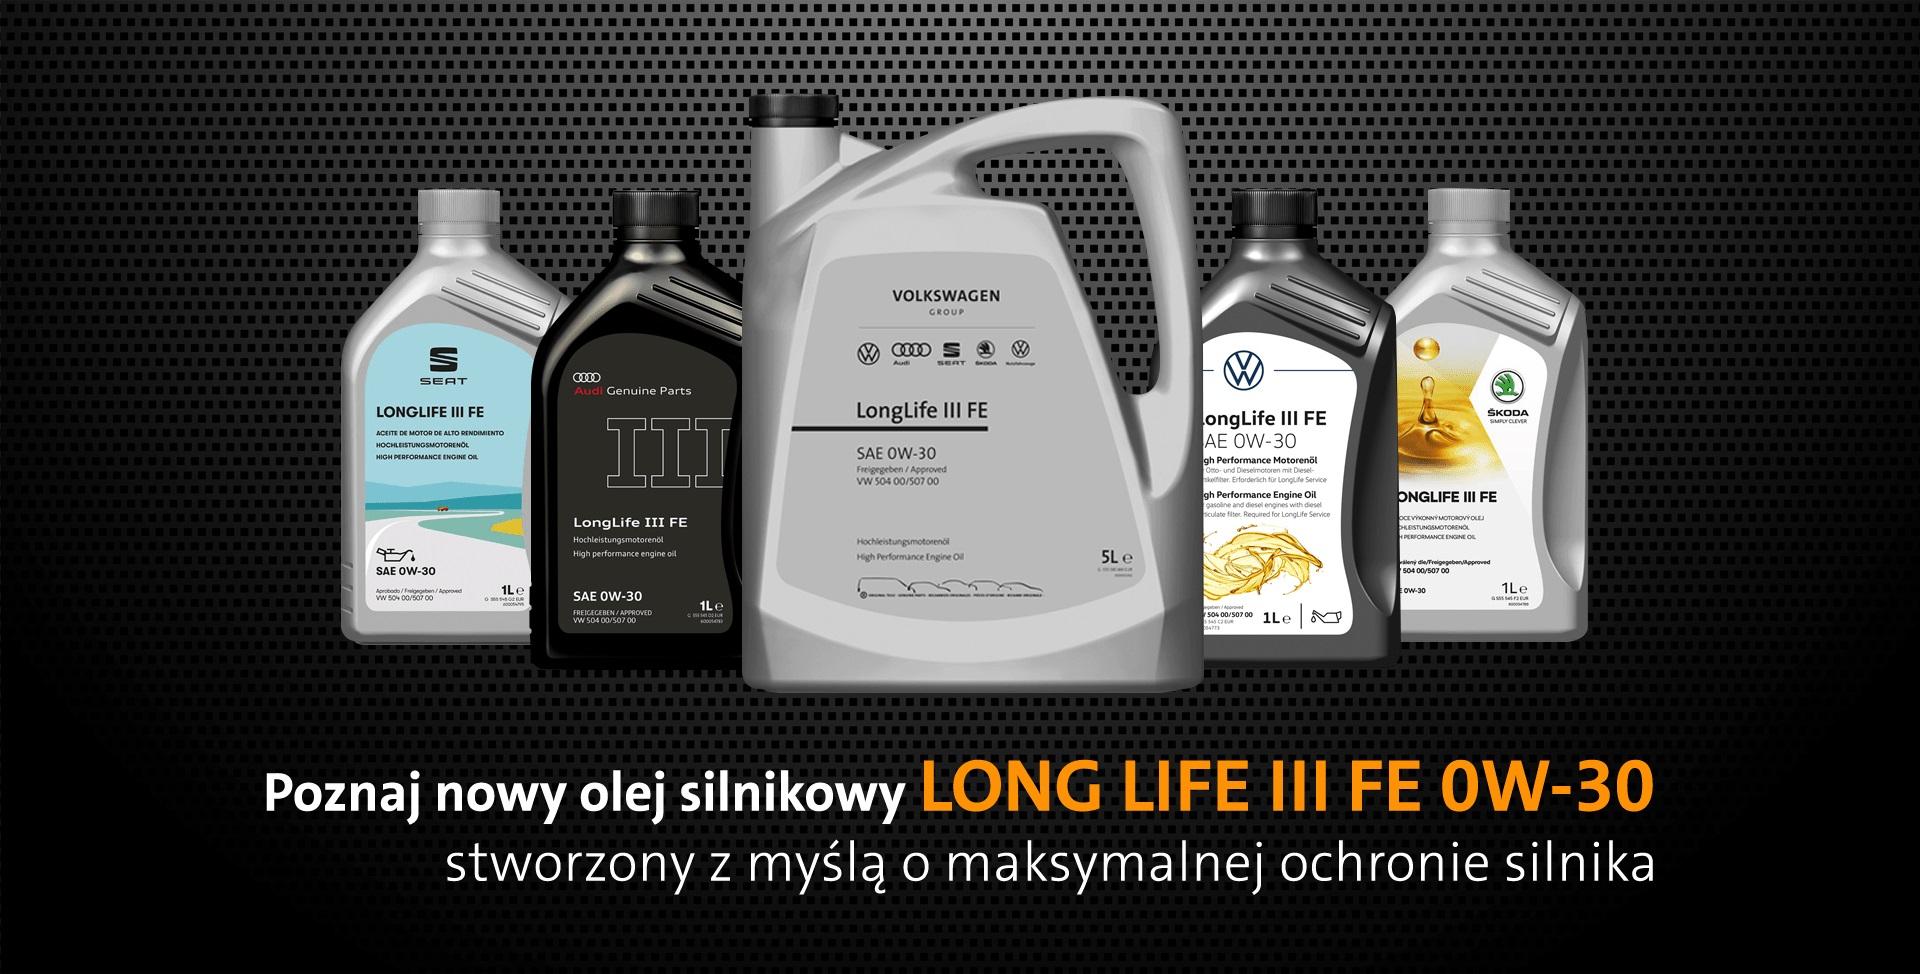 Olej rekomendowany przez koncern Volkswagen